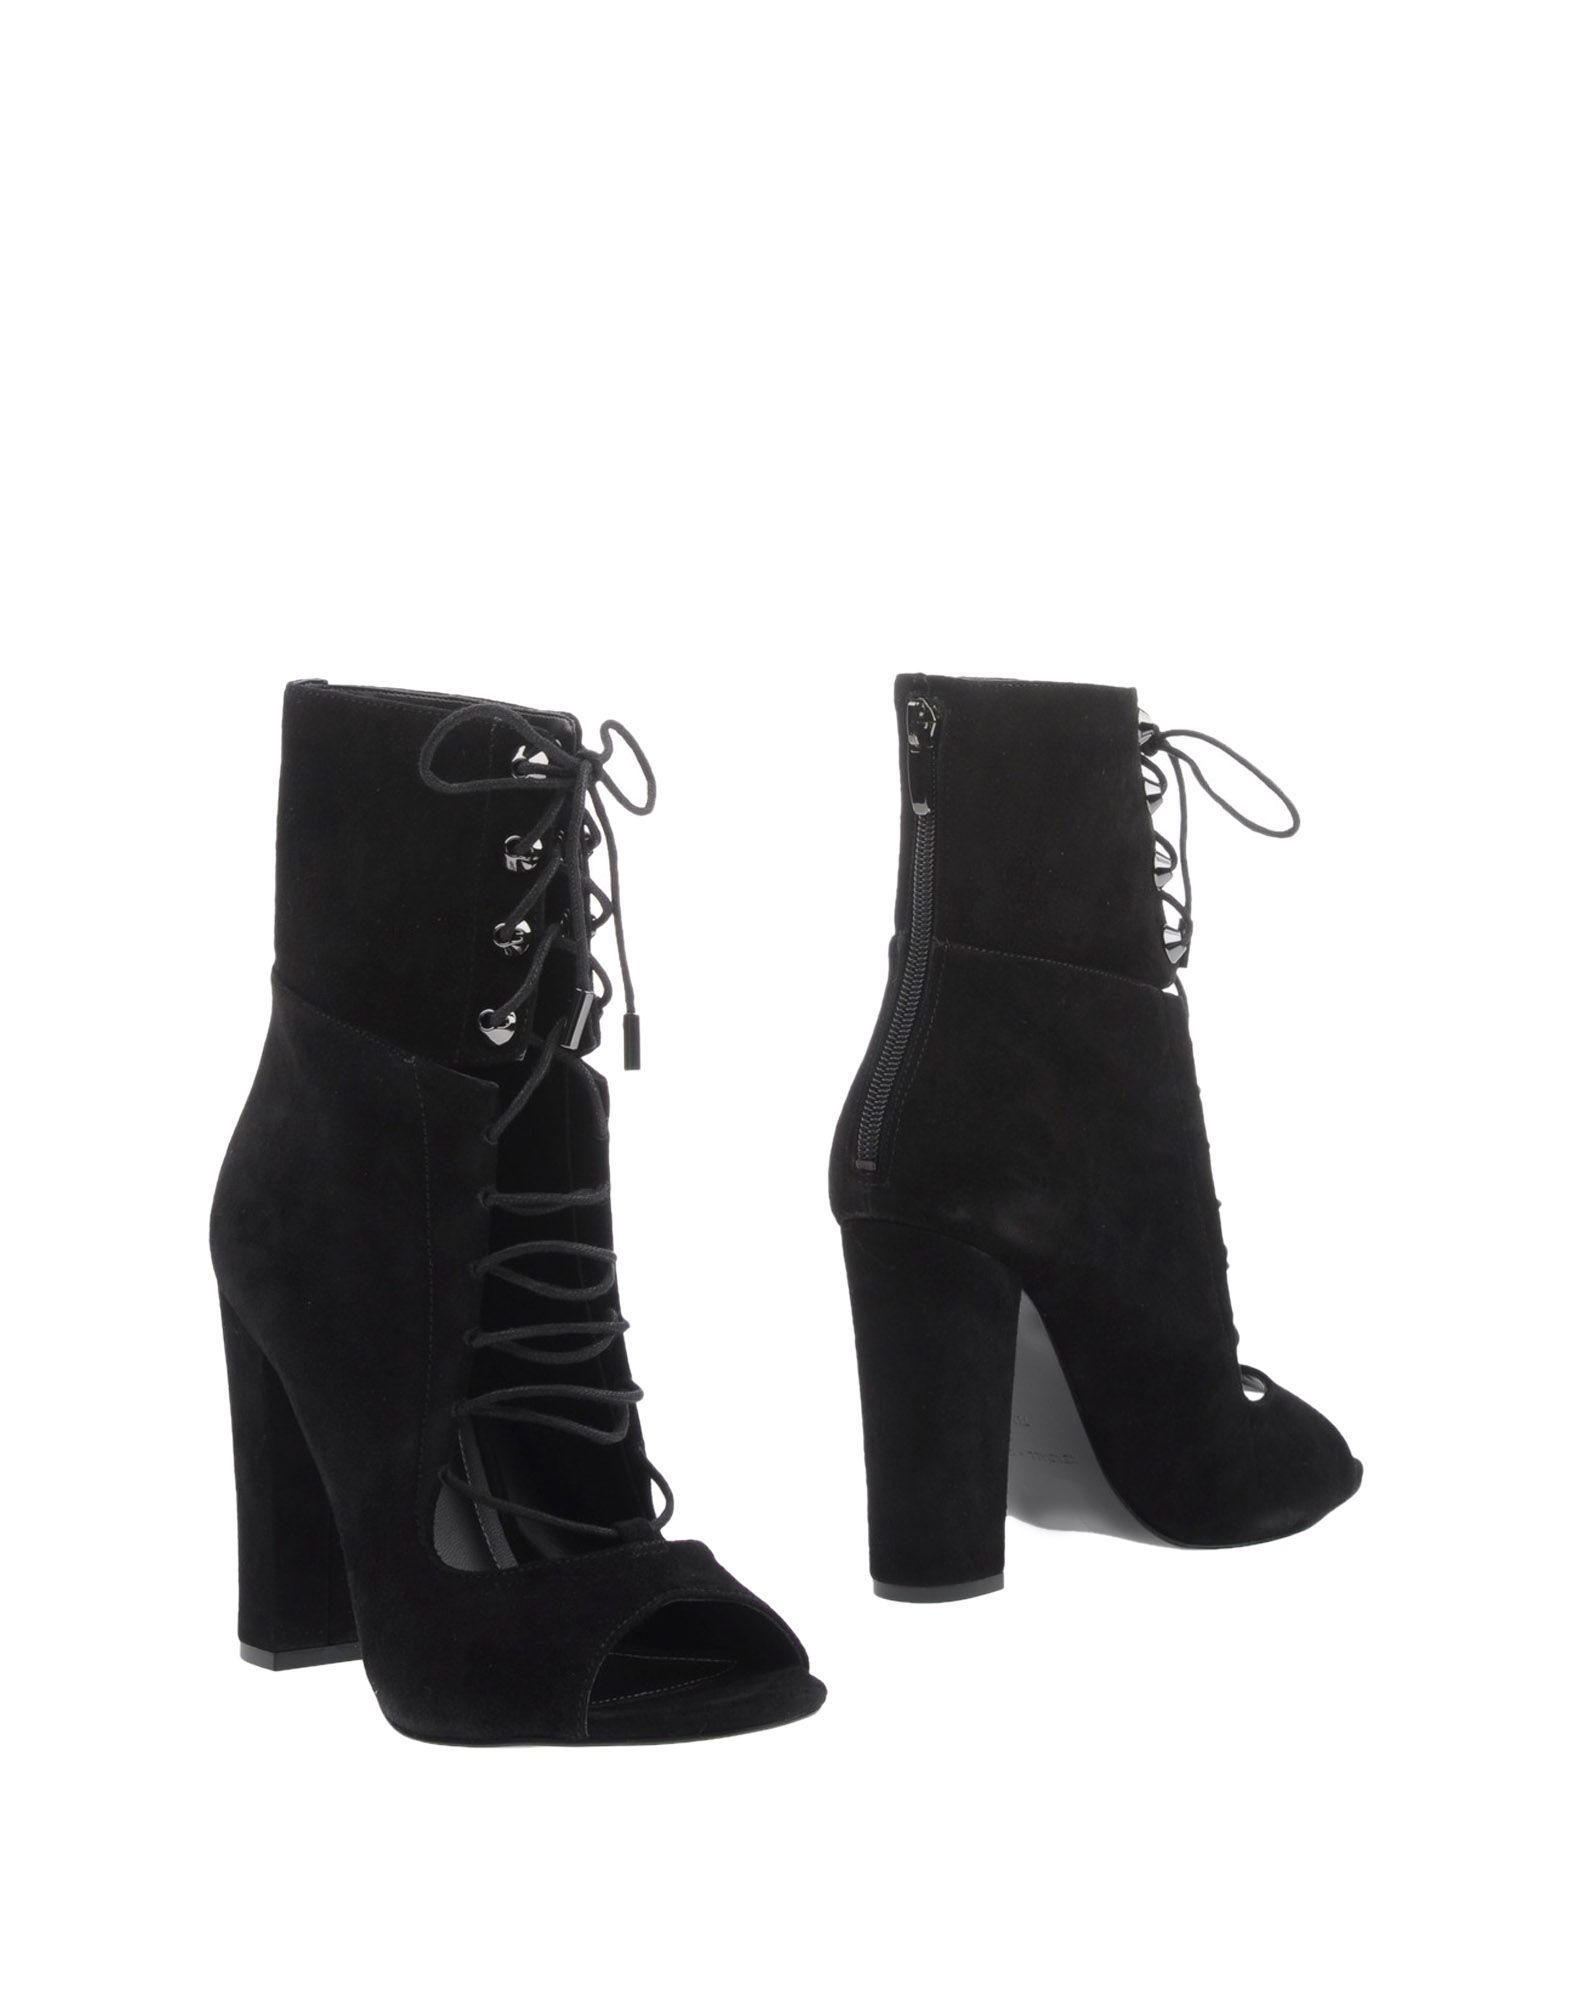 KENDALL + KYLIE Полусапоги и высокие ботинки kendall kylie полусапоги и высокие ботинки